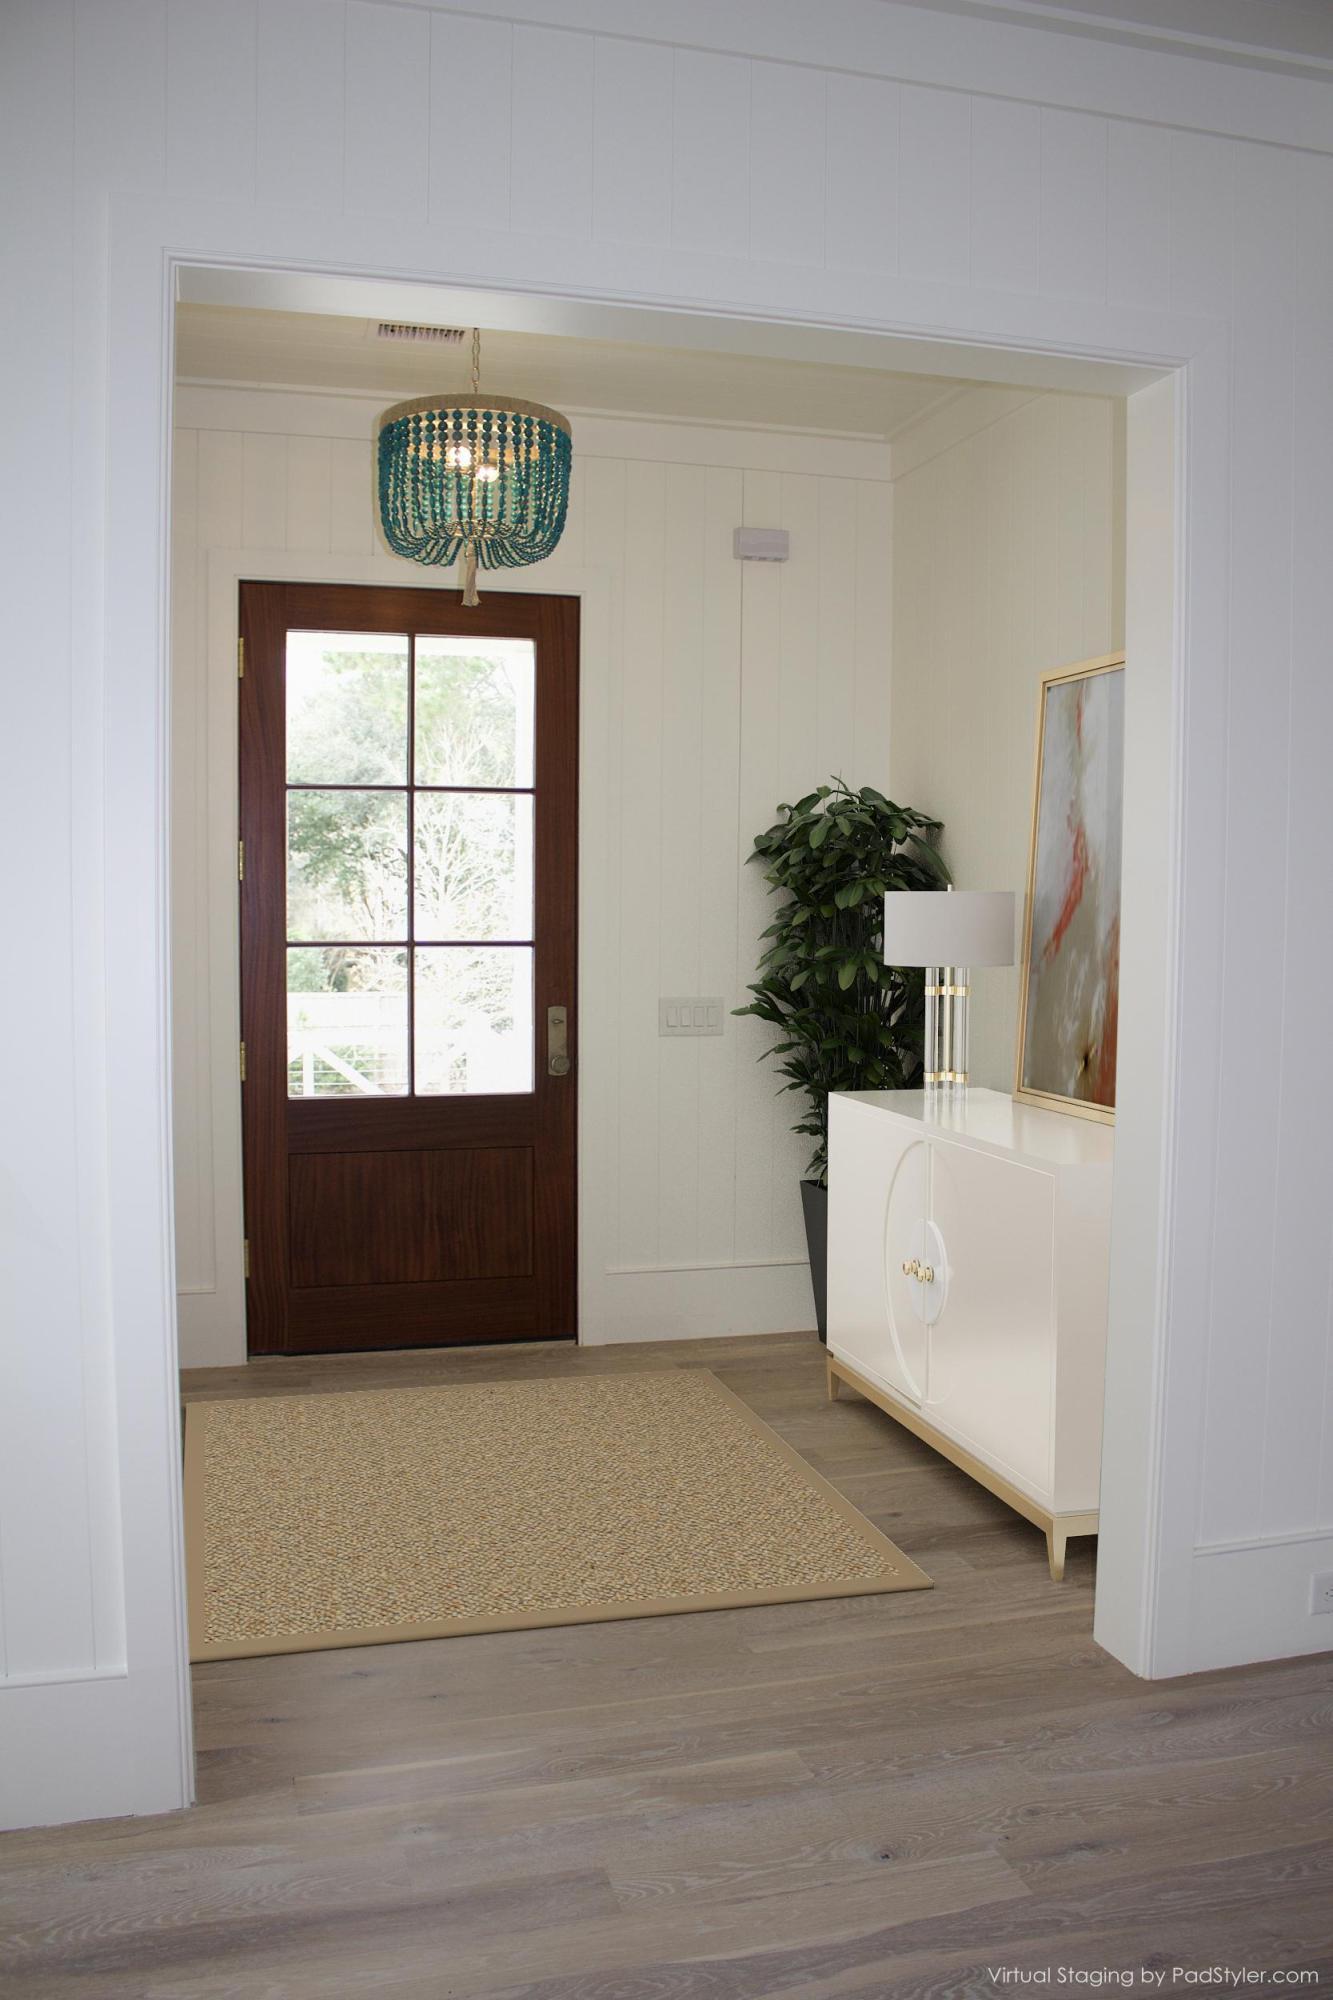 Mathis Ferry Court Homes For Sale - 1206 Clonmel, Mount Pleasant, SC - 22